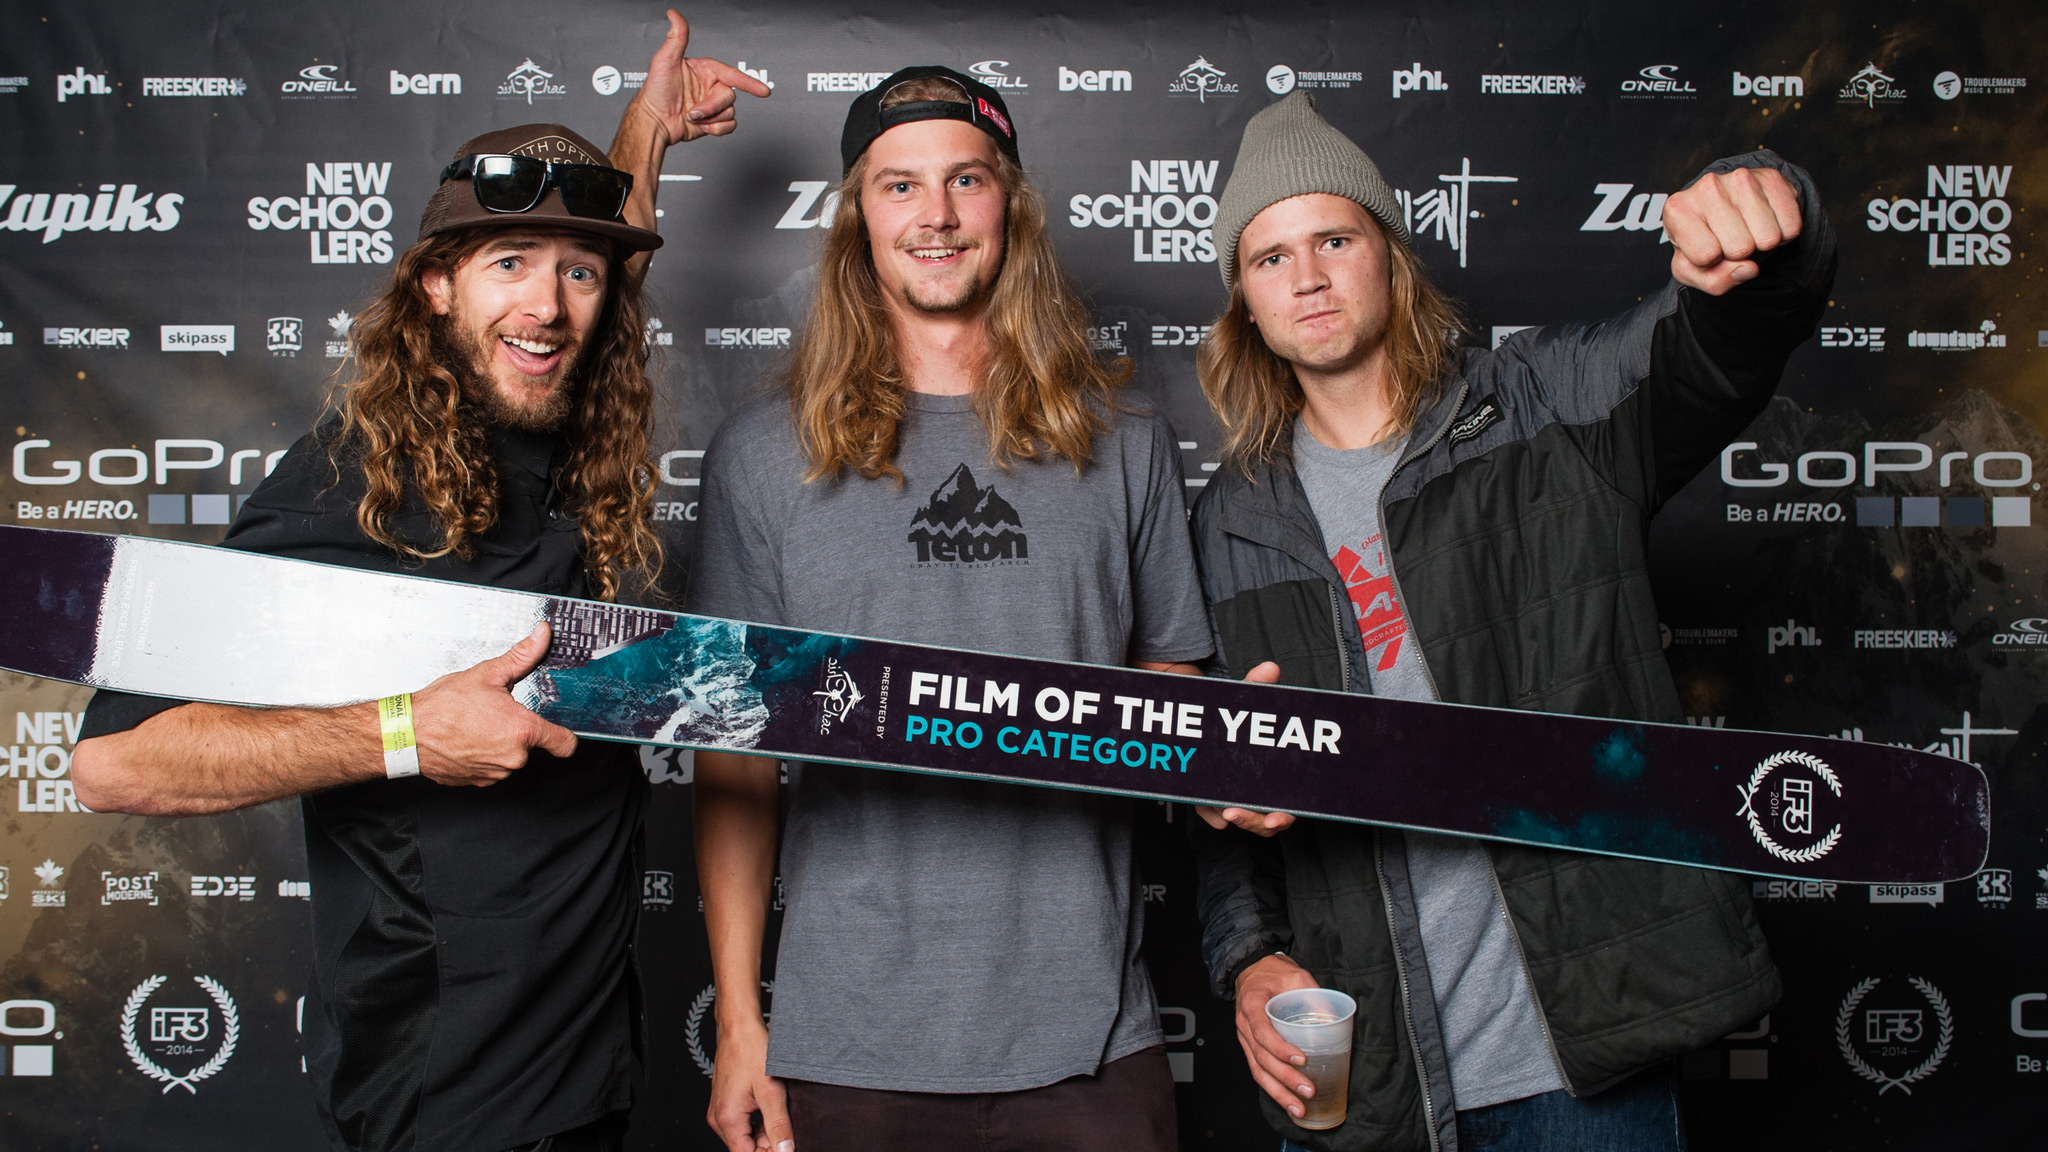 Best Pro Film